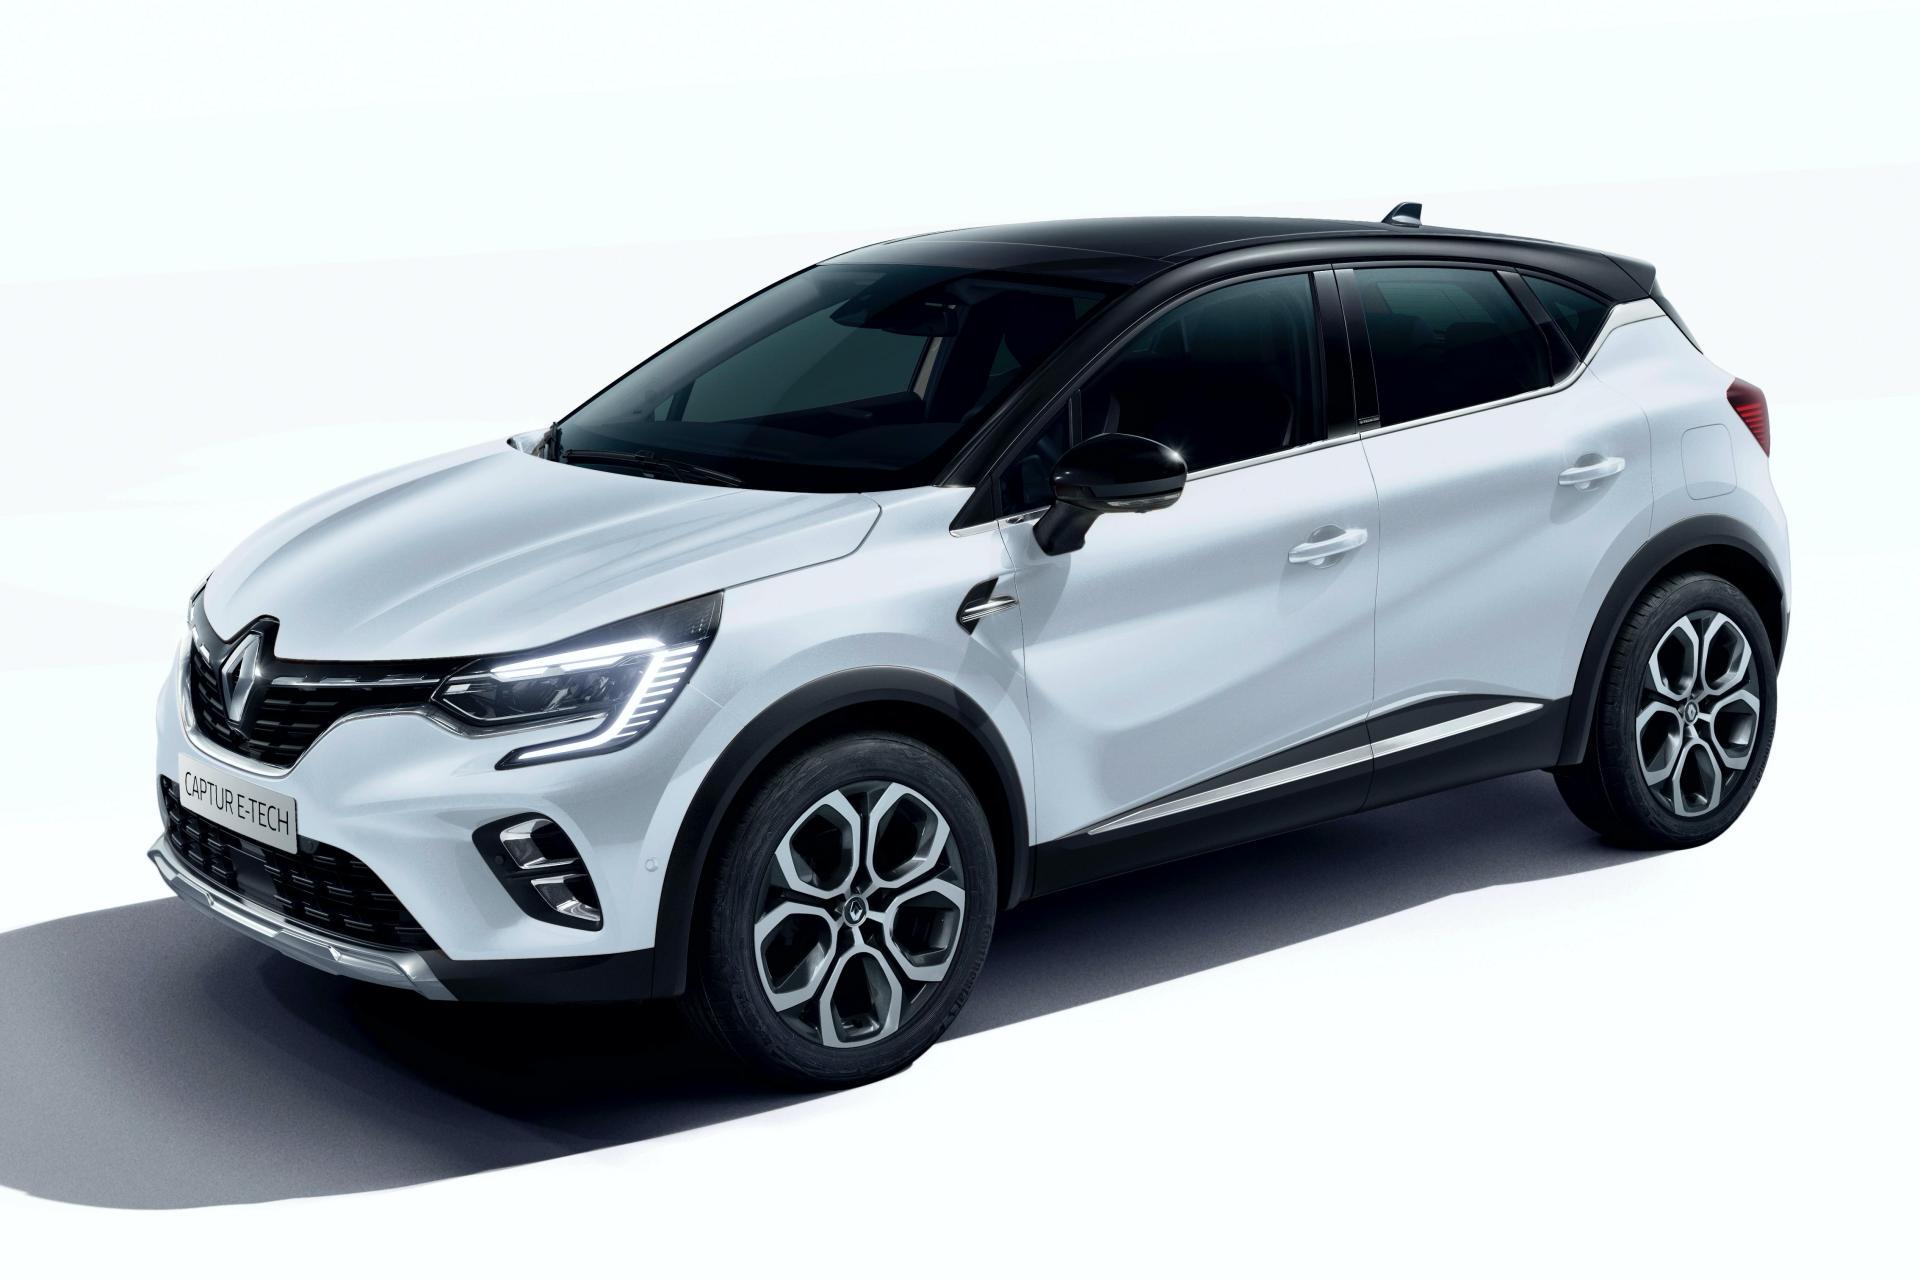 2020-Renault-Captur-E-Tech-plug-in-hybrid-4